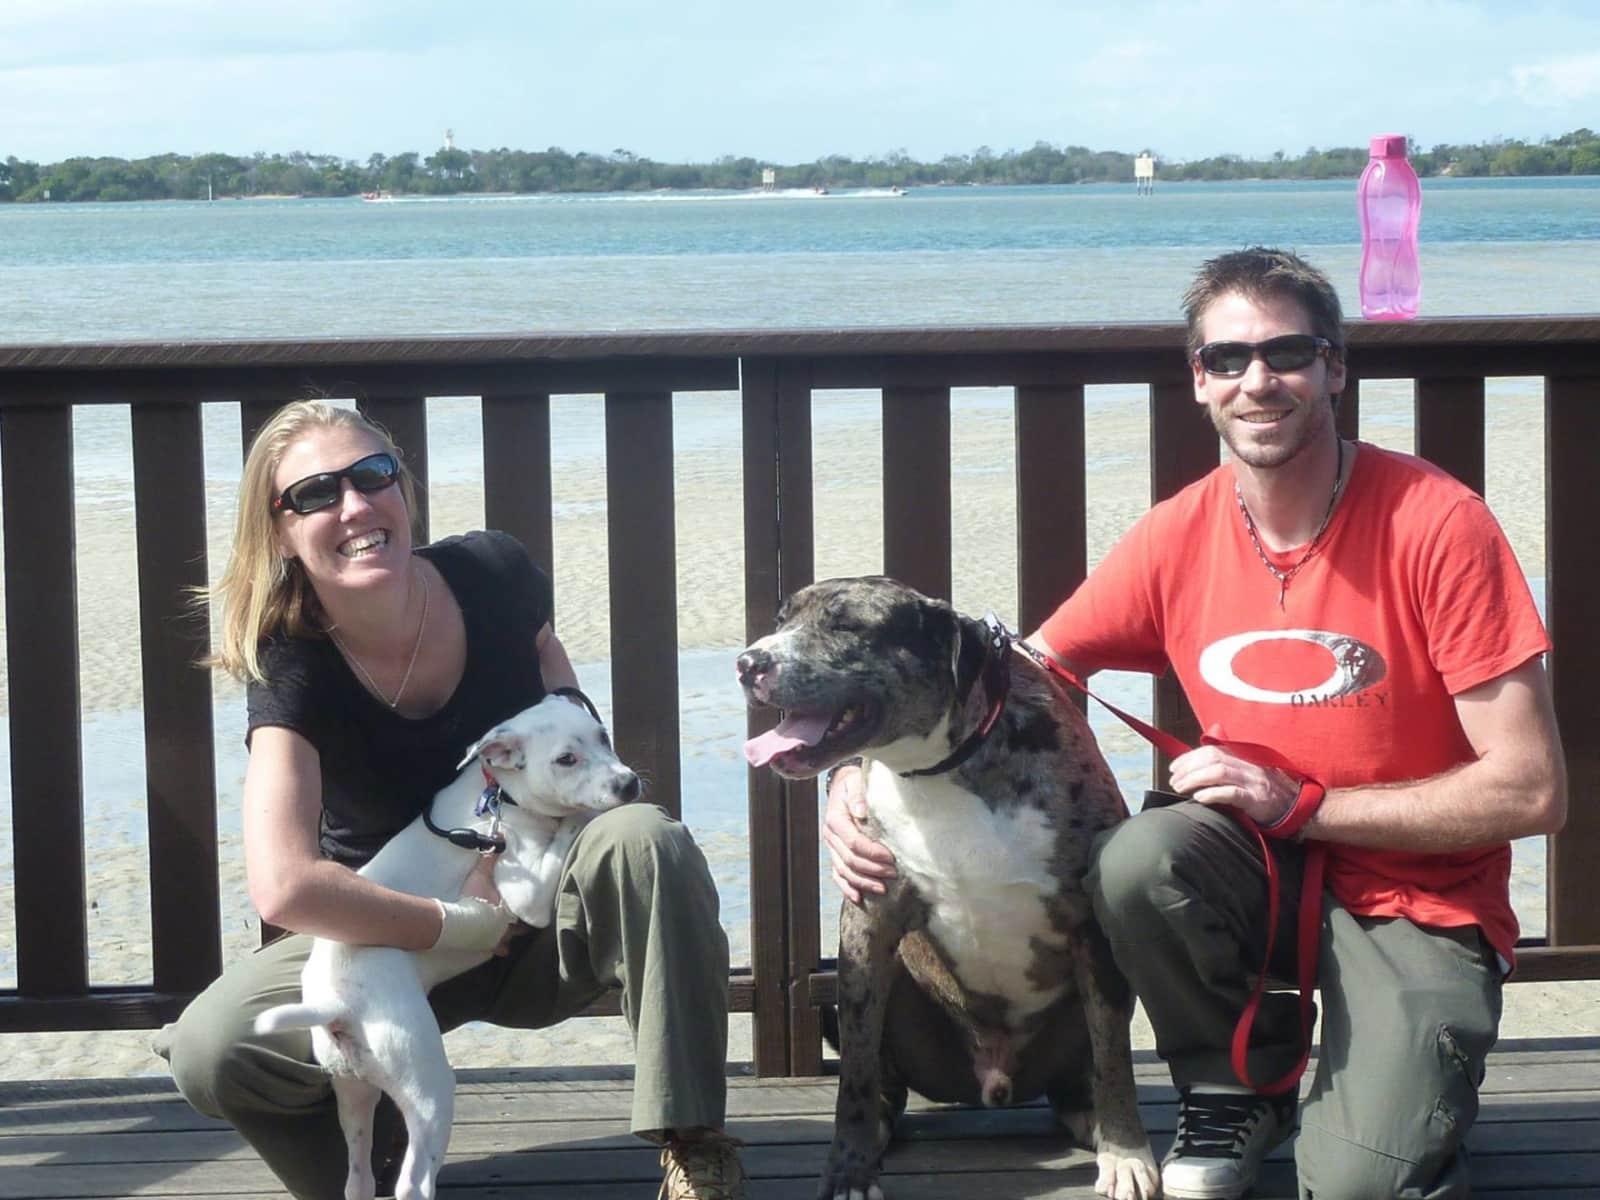 Gemma & Will from Caloundra, Queensland, Australia